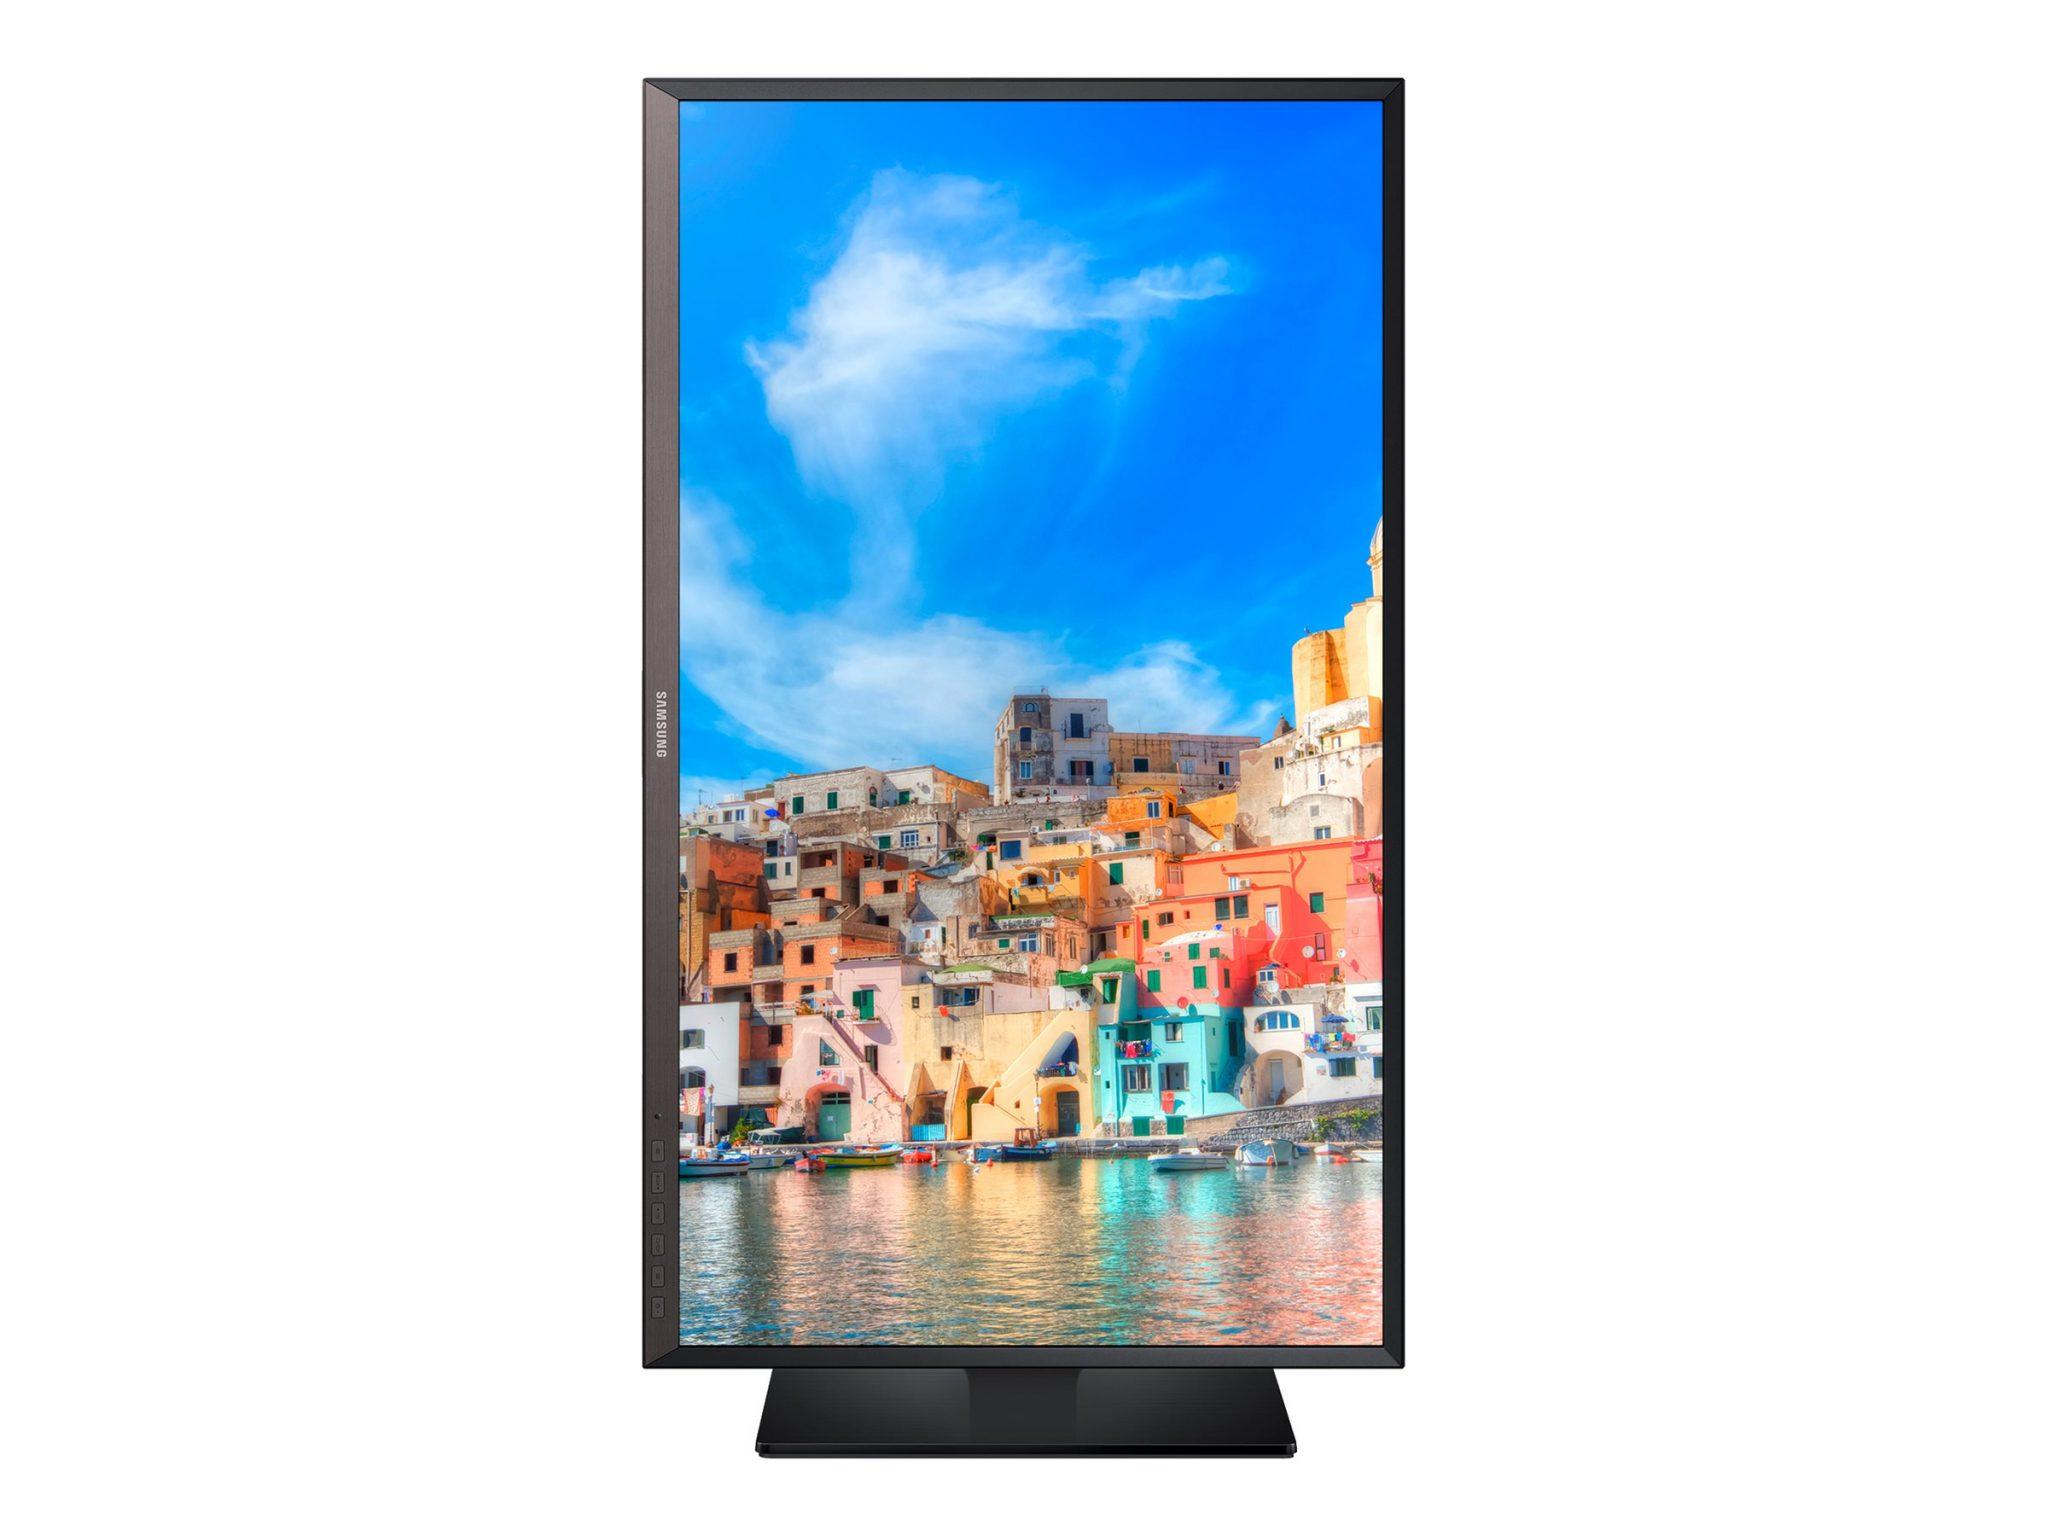 samsung 8 series s27d850t monitor acs. Black Bedroom Furniture Sets. Home Design Ideas